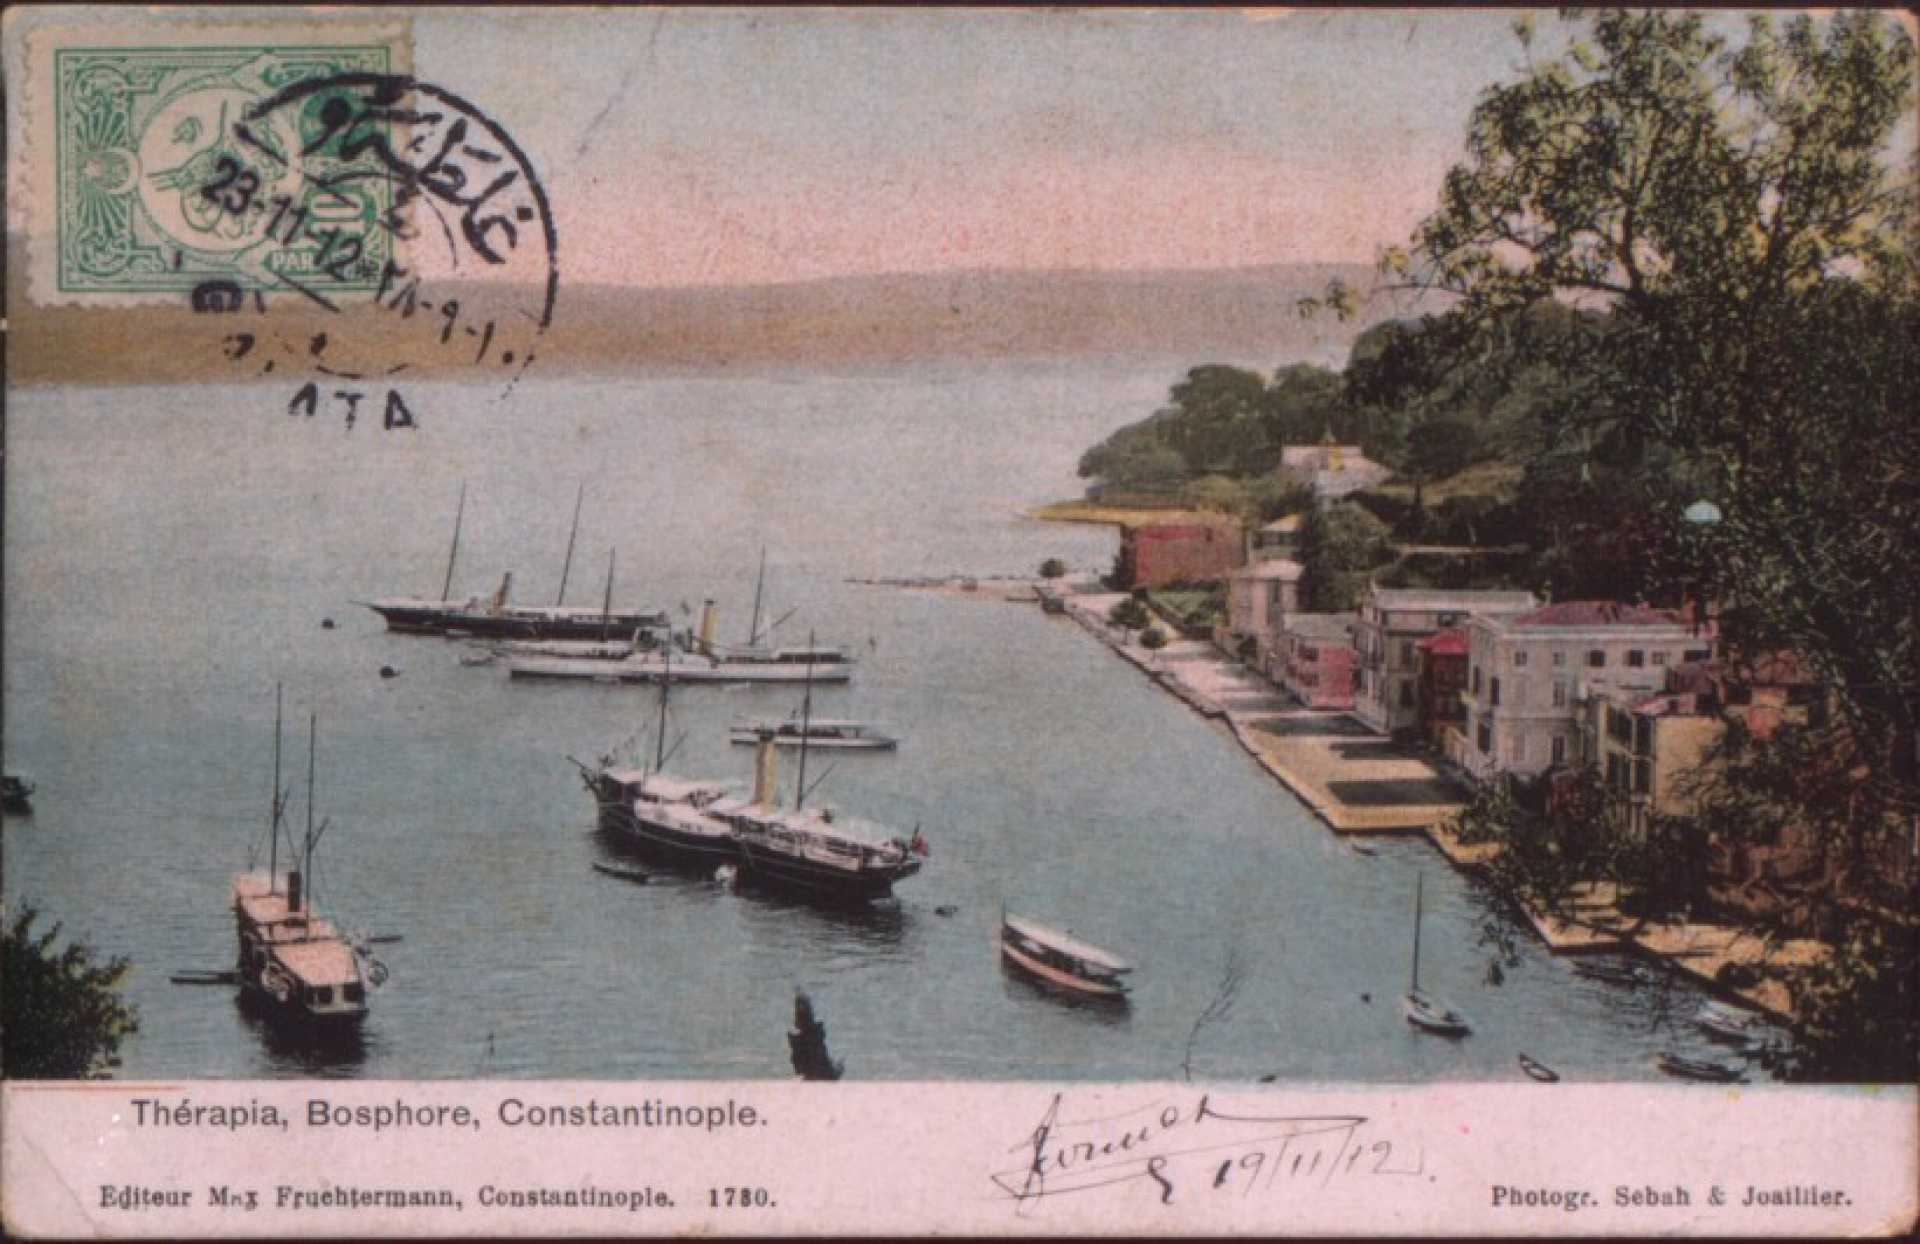 Therapia. Bosphore. Constantinople.